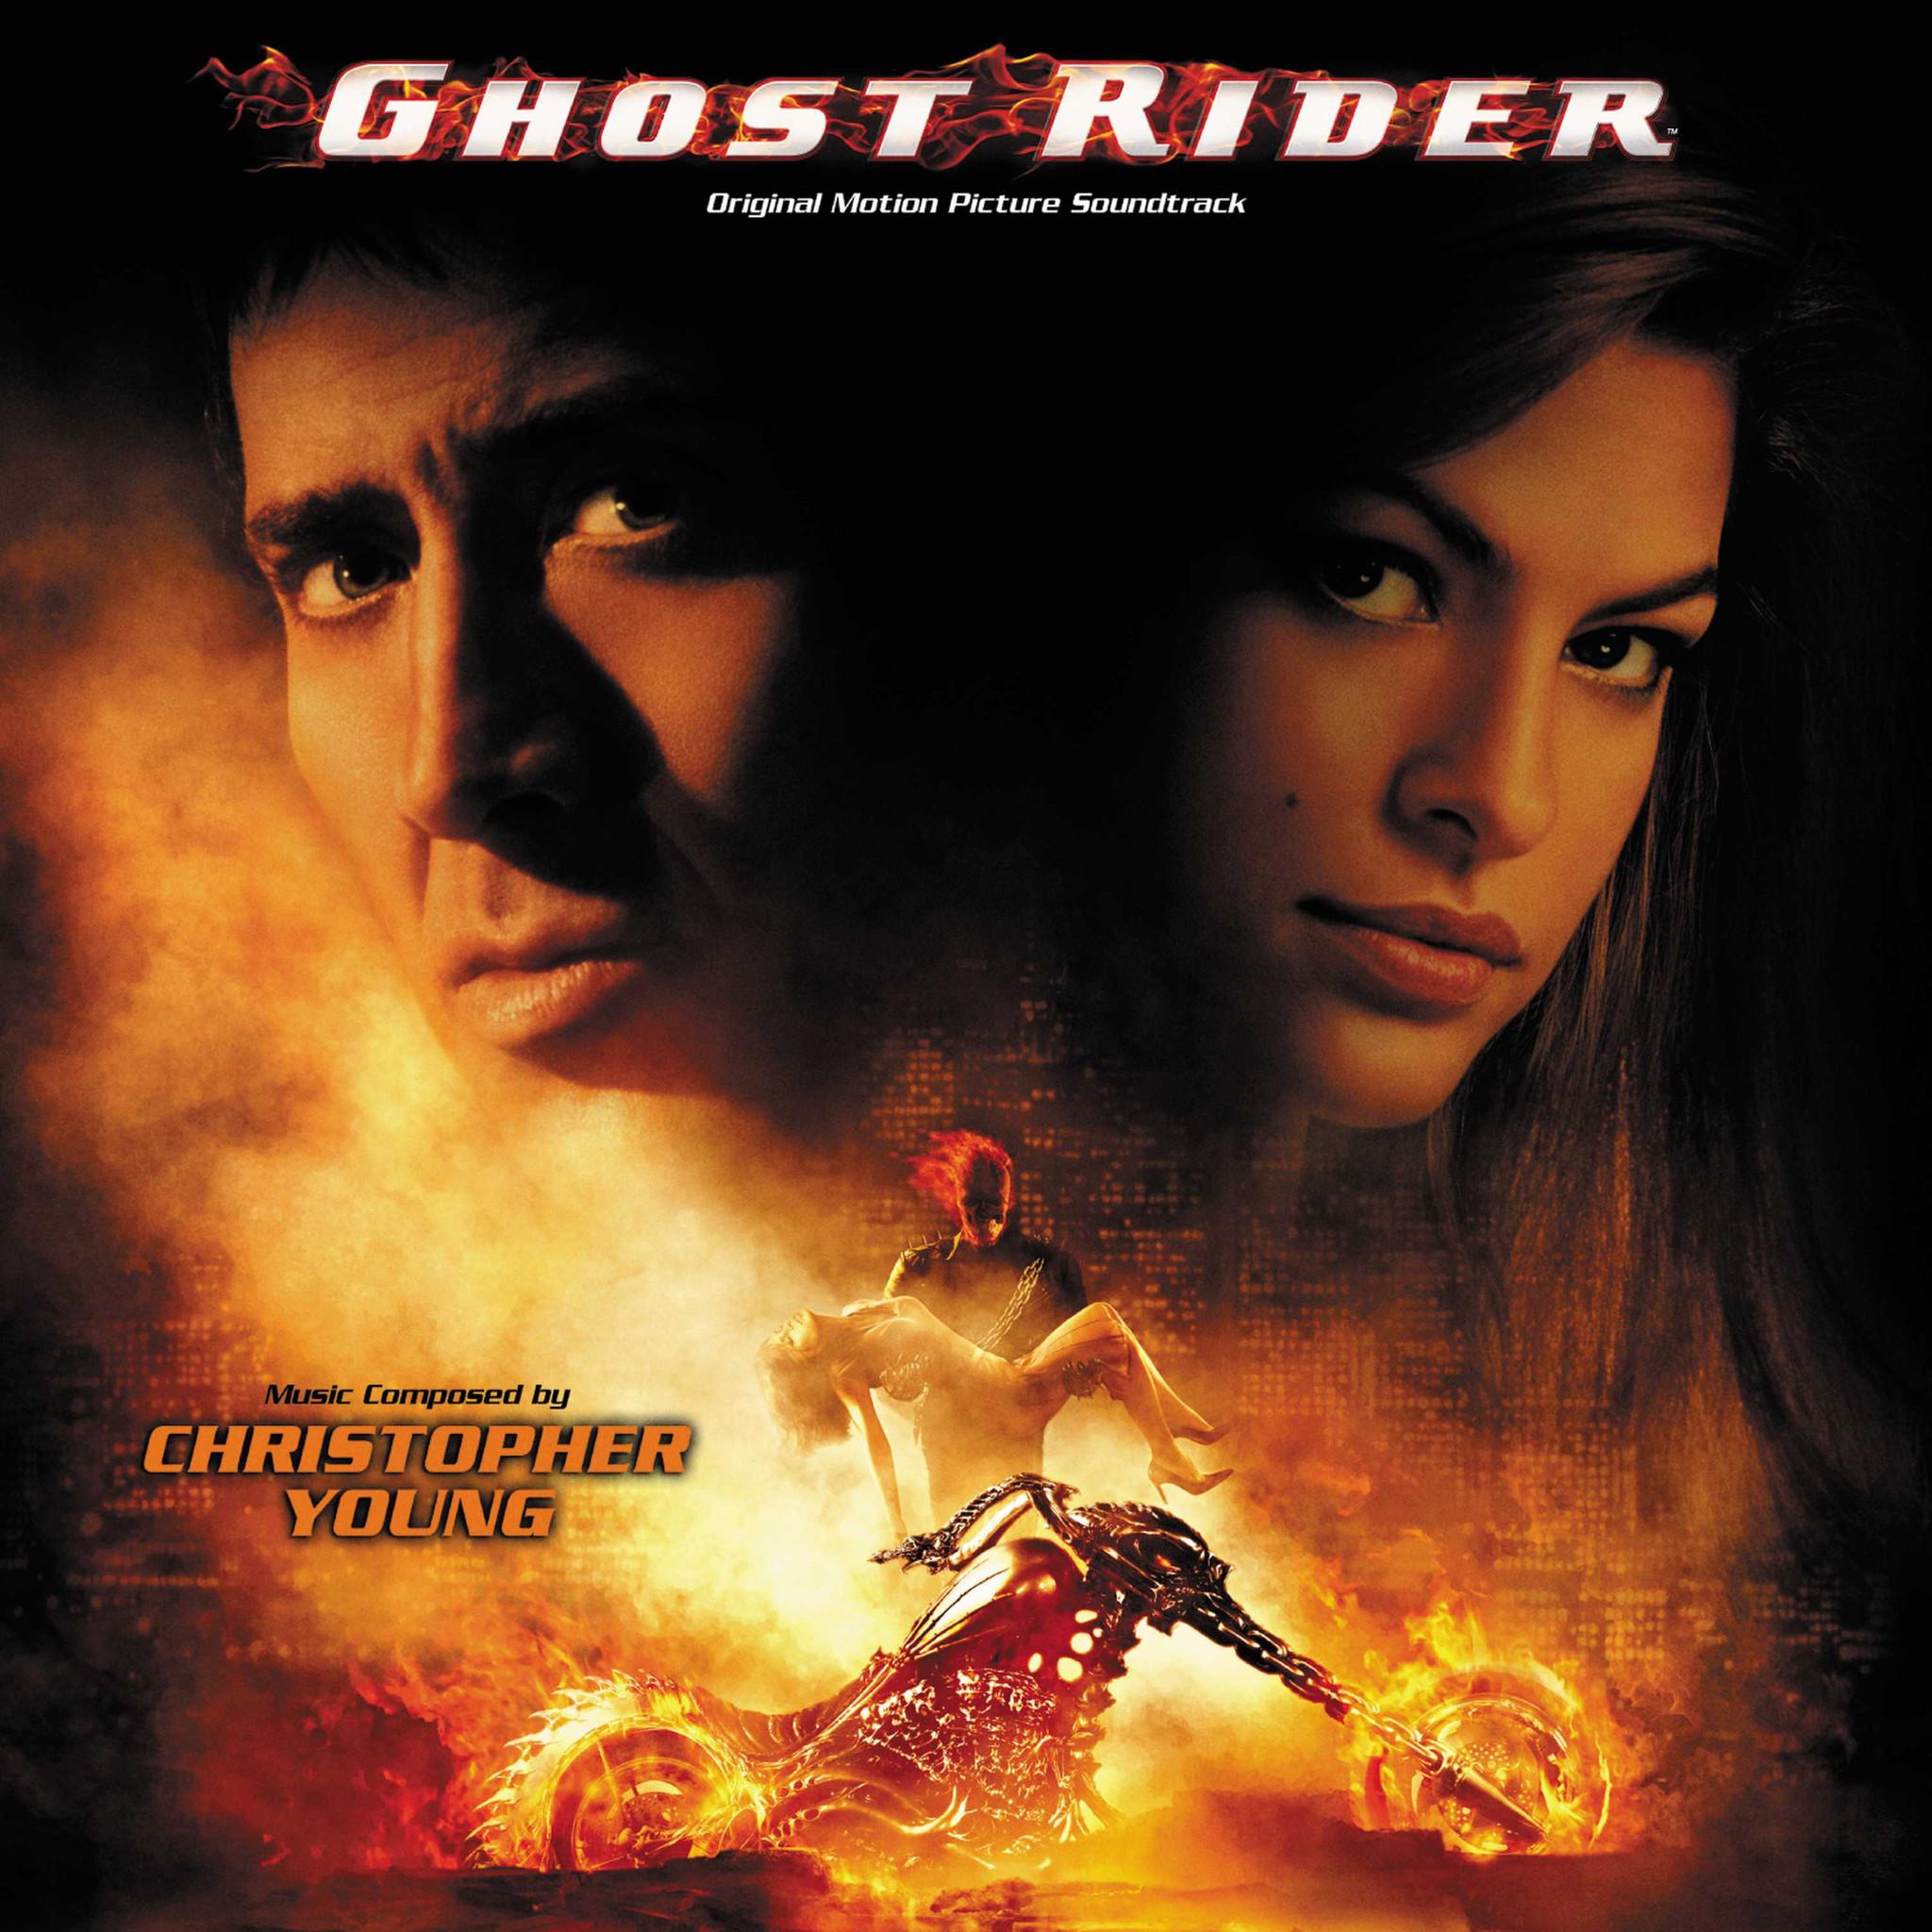 Ghost Rider (Score) / O.s.t. - Ghost Rider (Score) / O.s.t. - Musik - SOUNDTRACK/SCORE - 0030206678925 - February 13, 2007